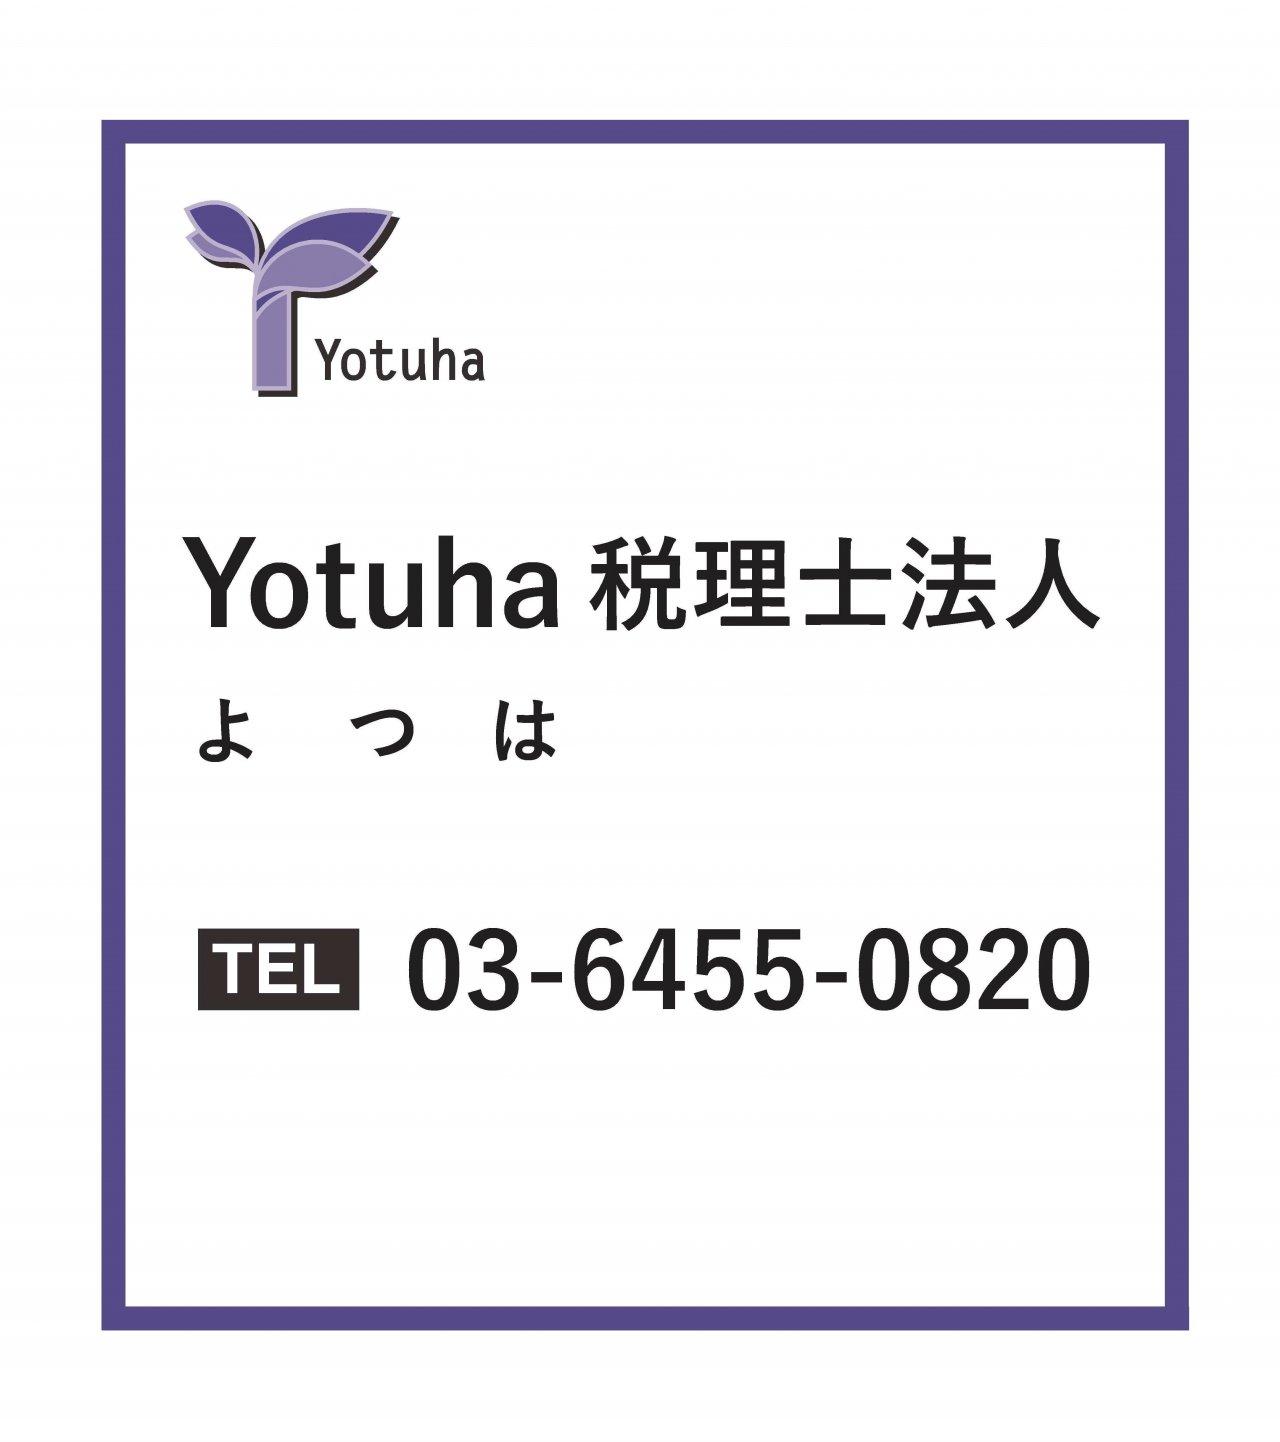 yotuha税理士法人